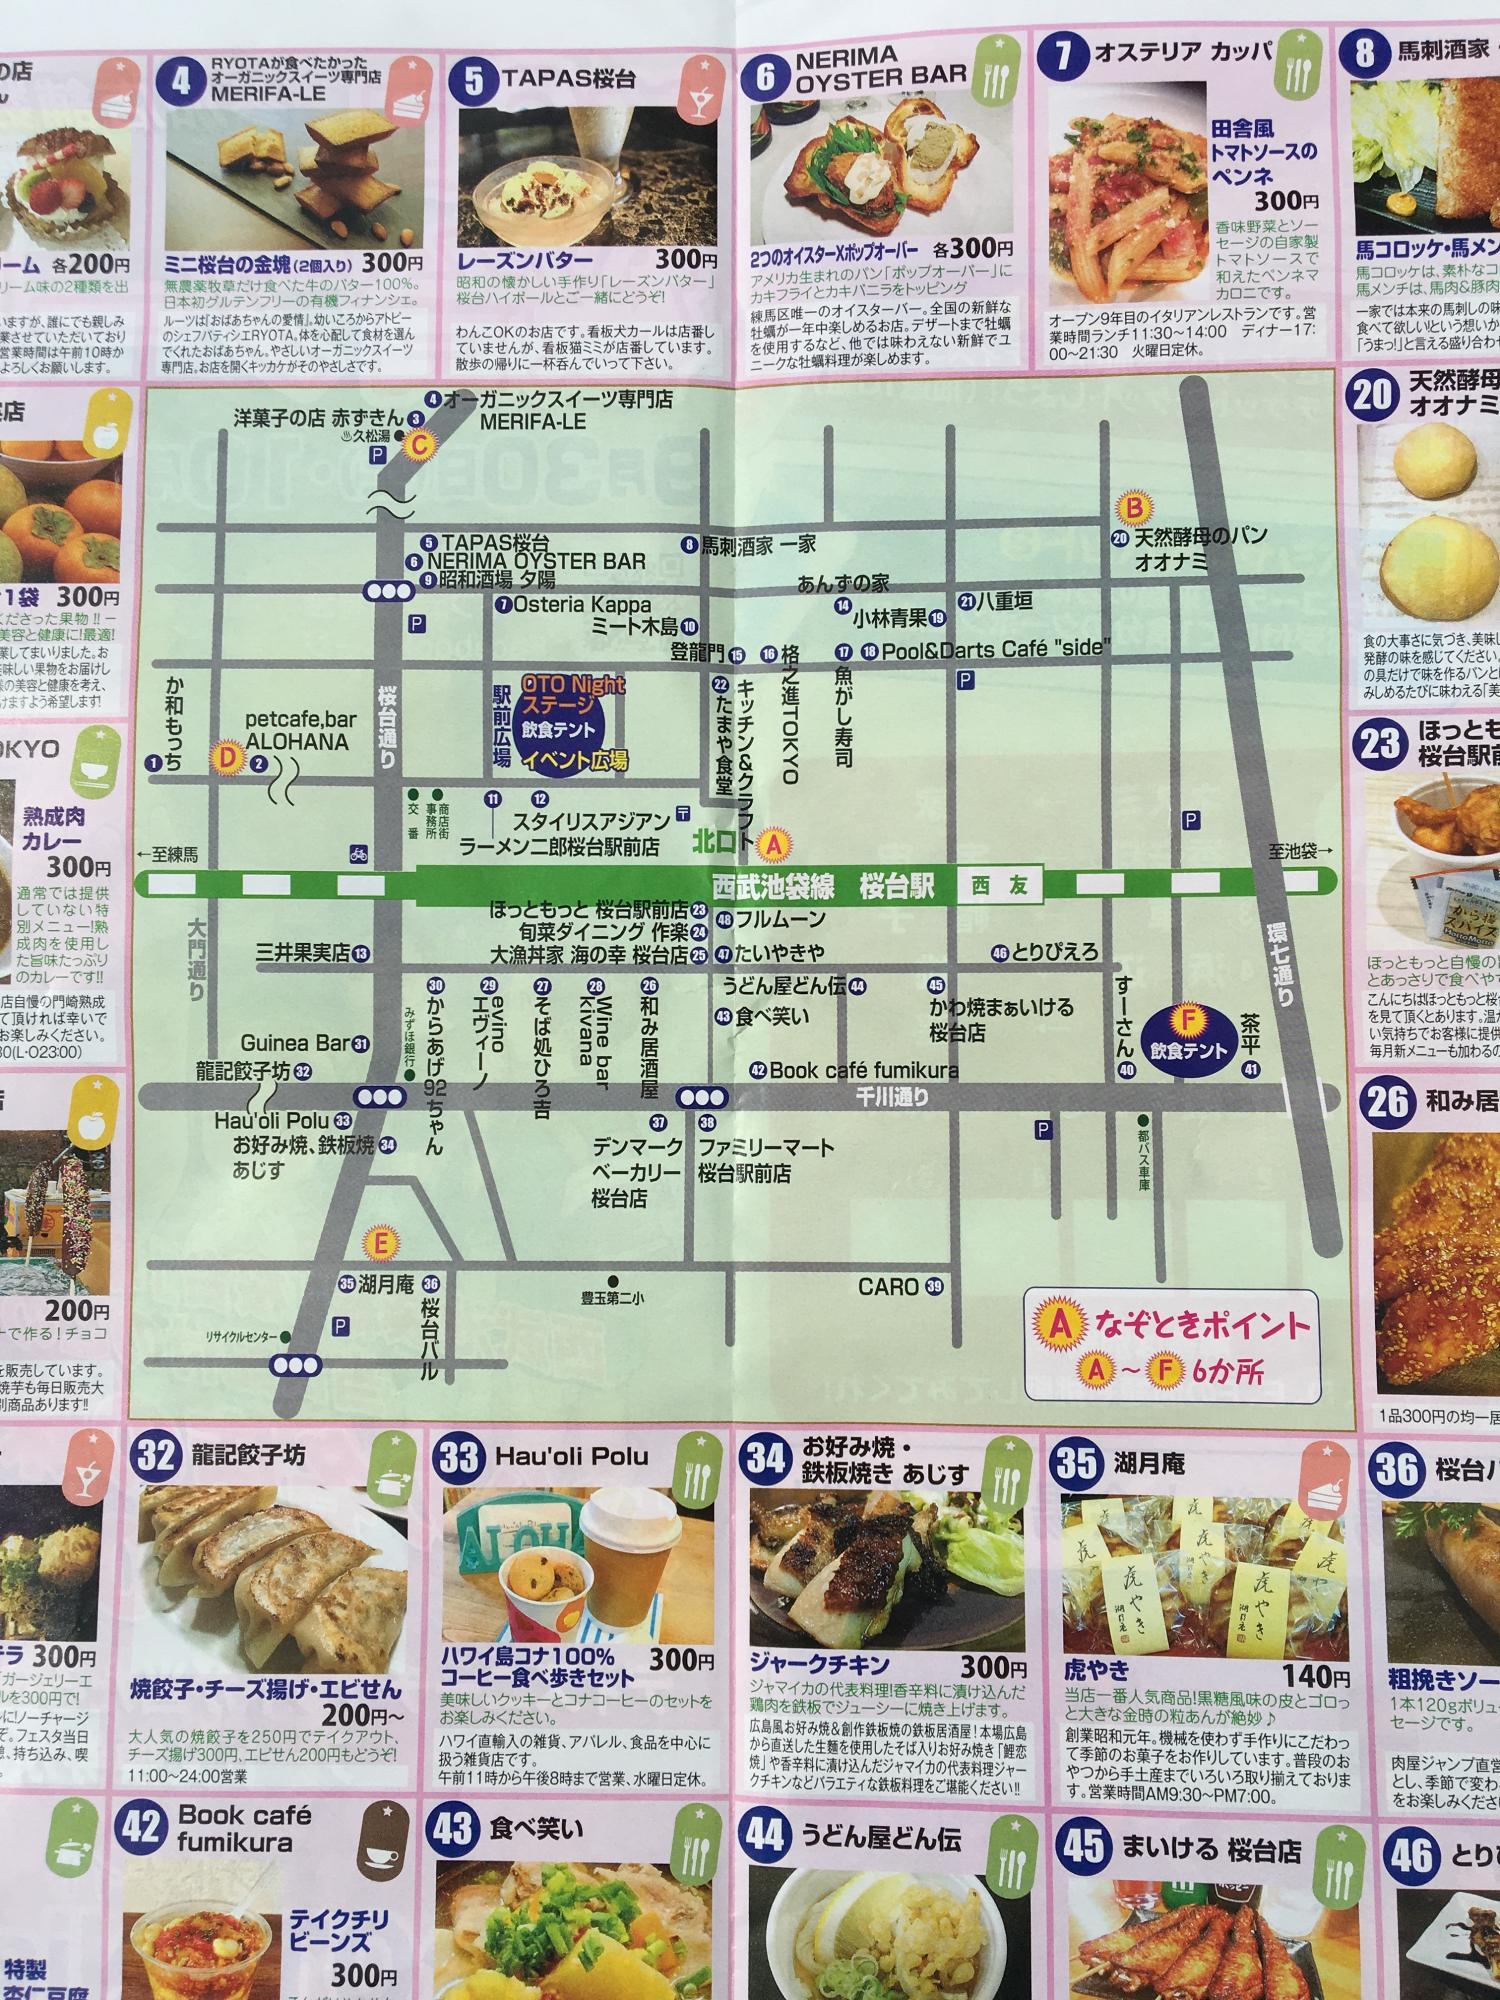 Sakuradai foods Festa map